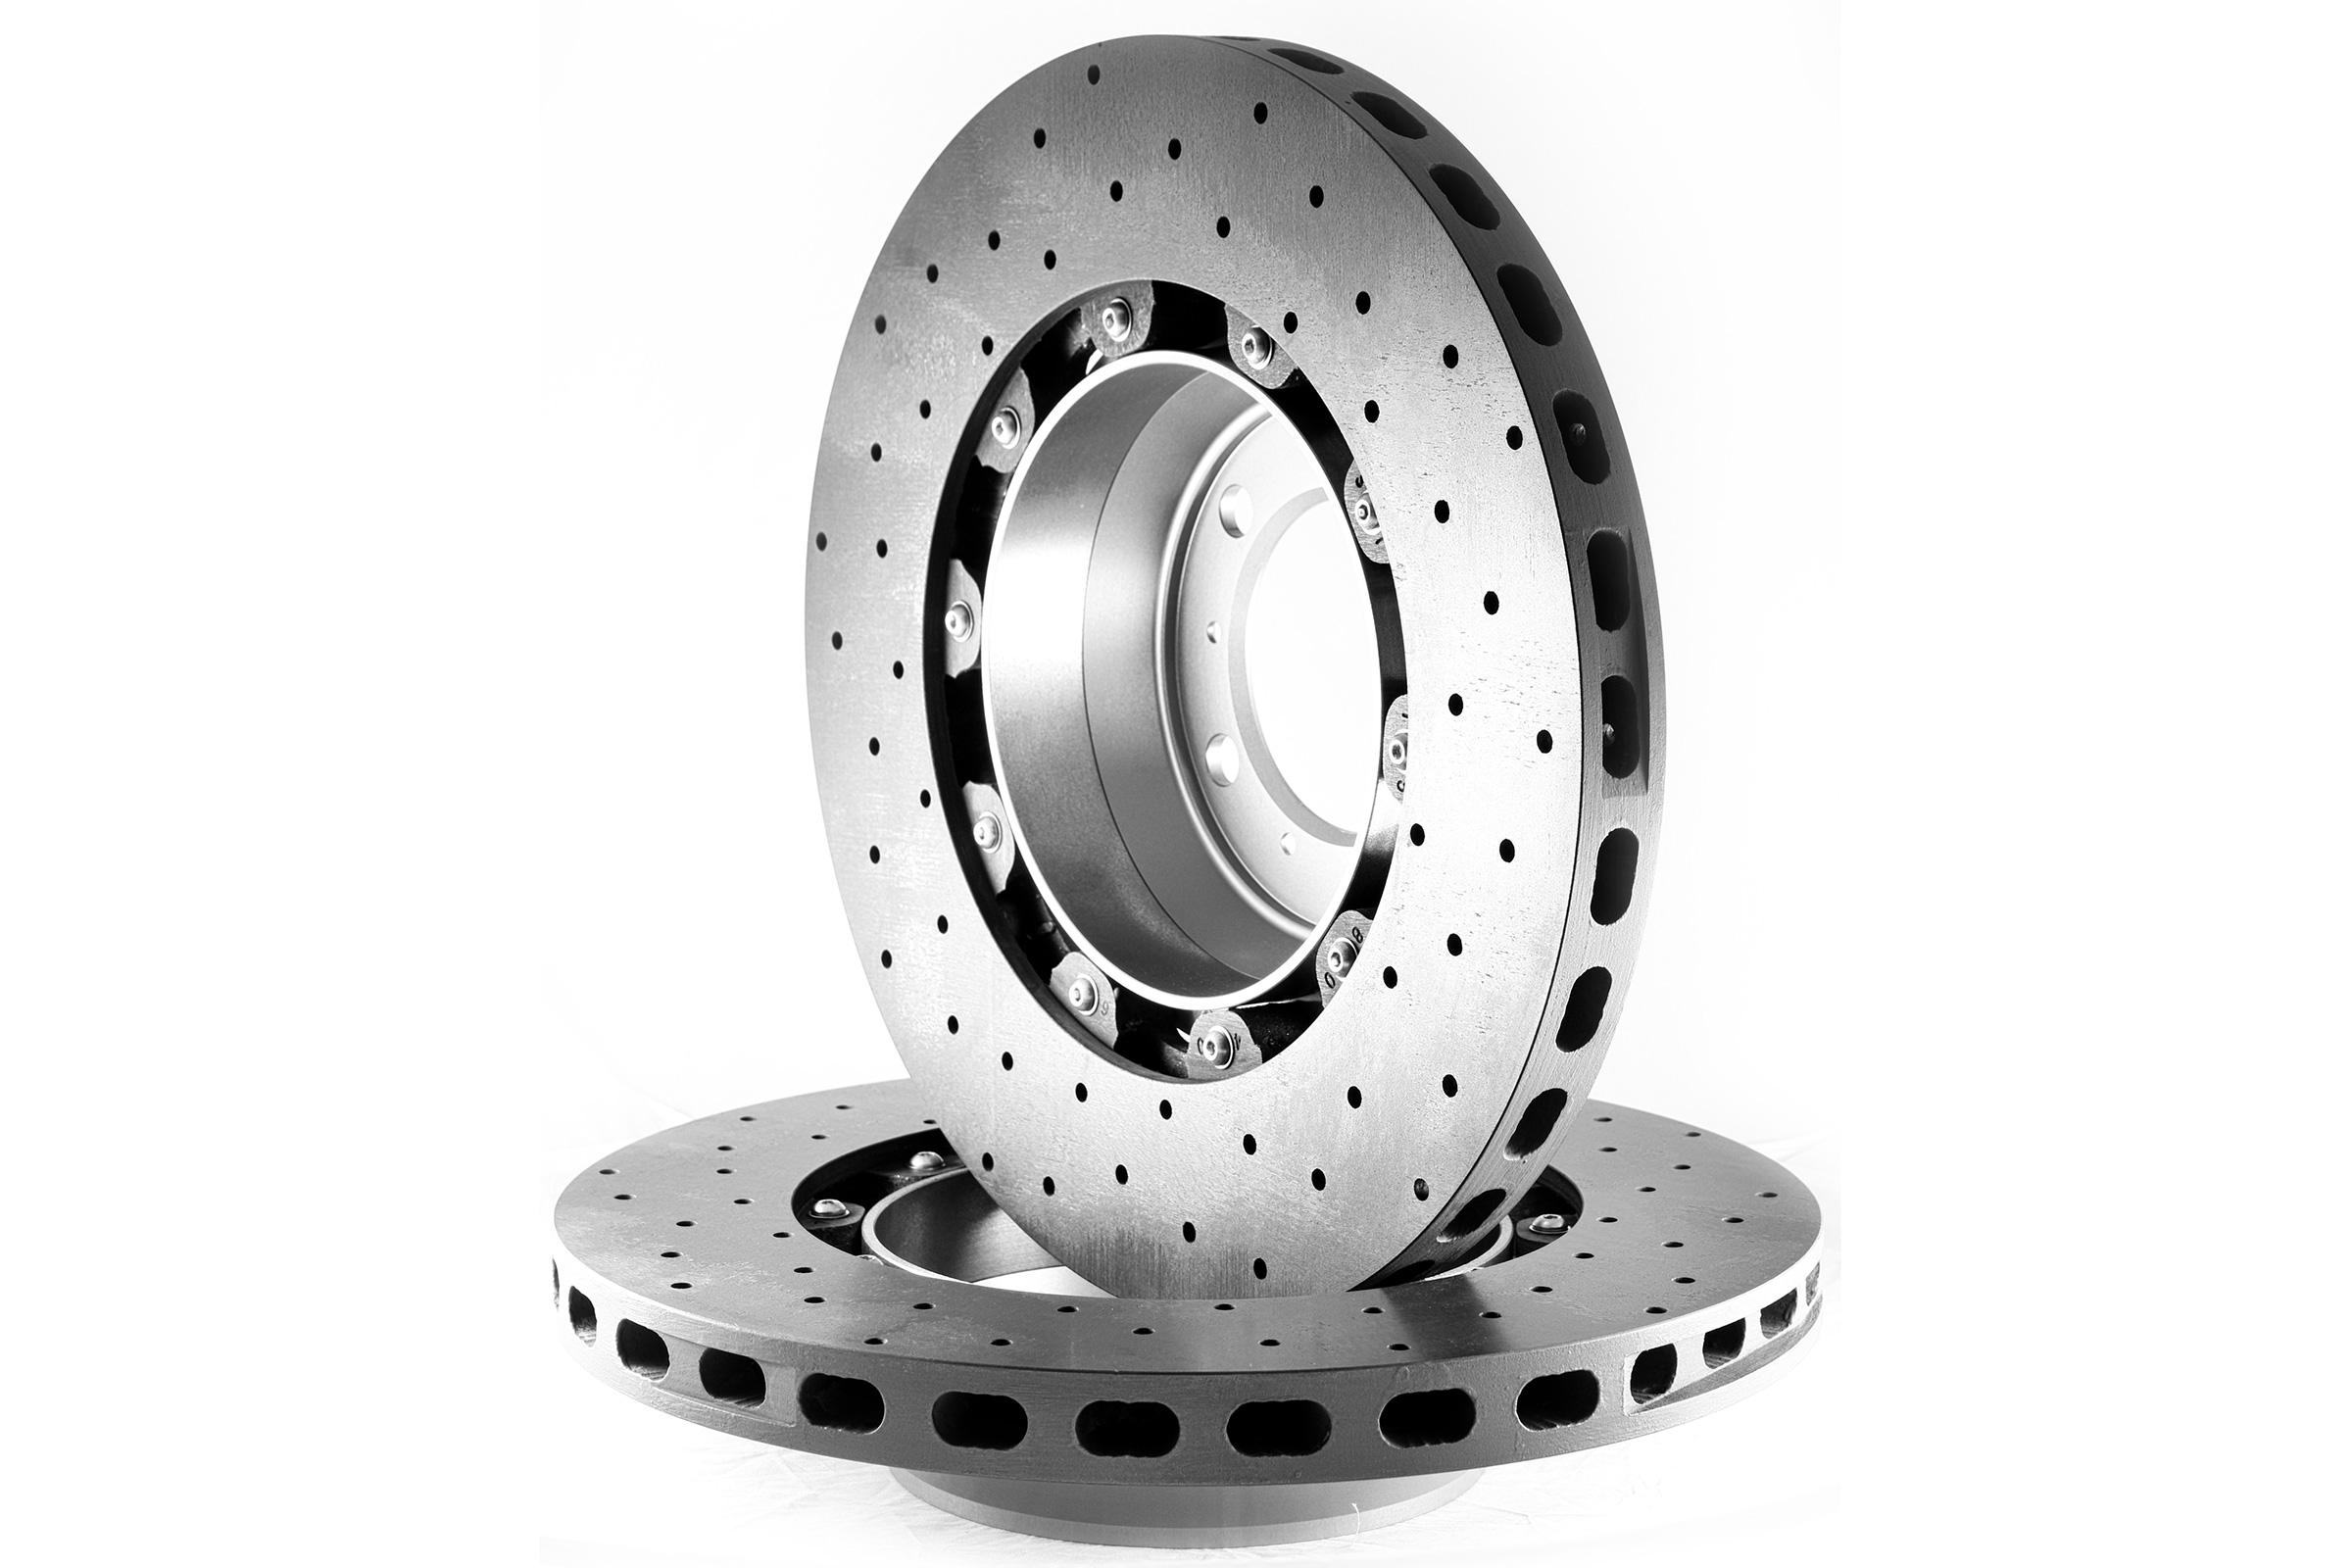 Aftermarket car brake upgrades: do performance brakes from